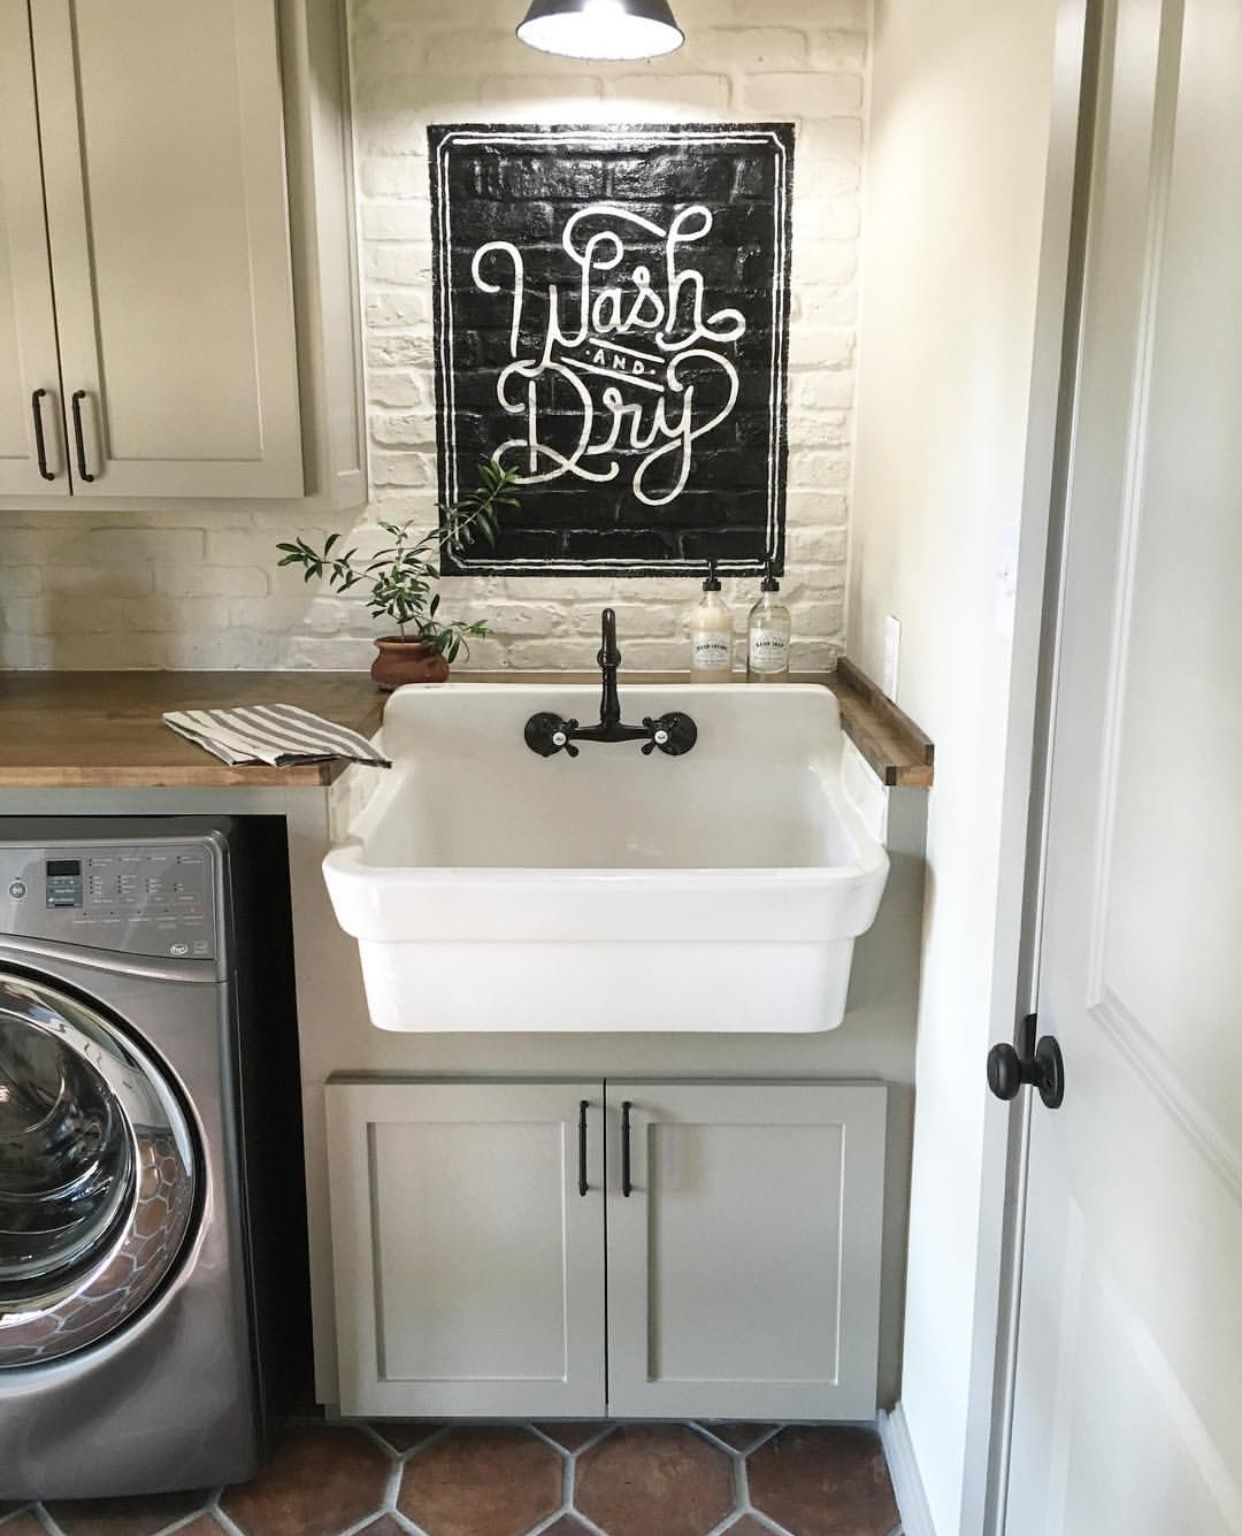 Pin by ashley ramirez on home decor pinterest sinks laundry and